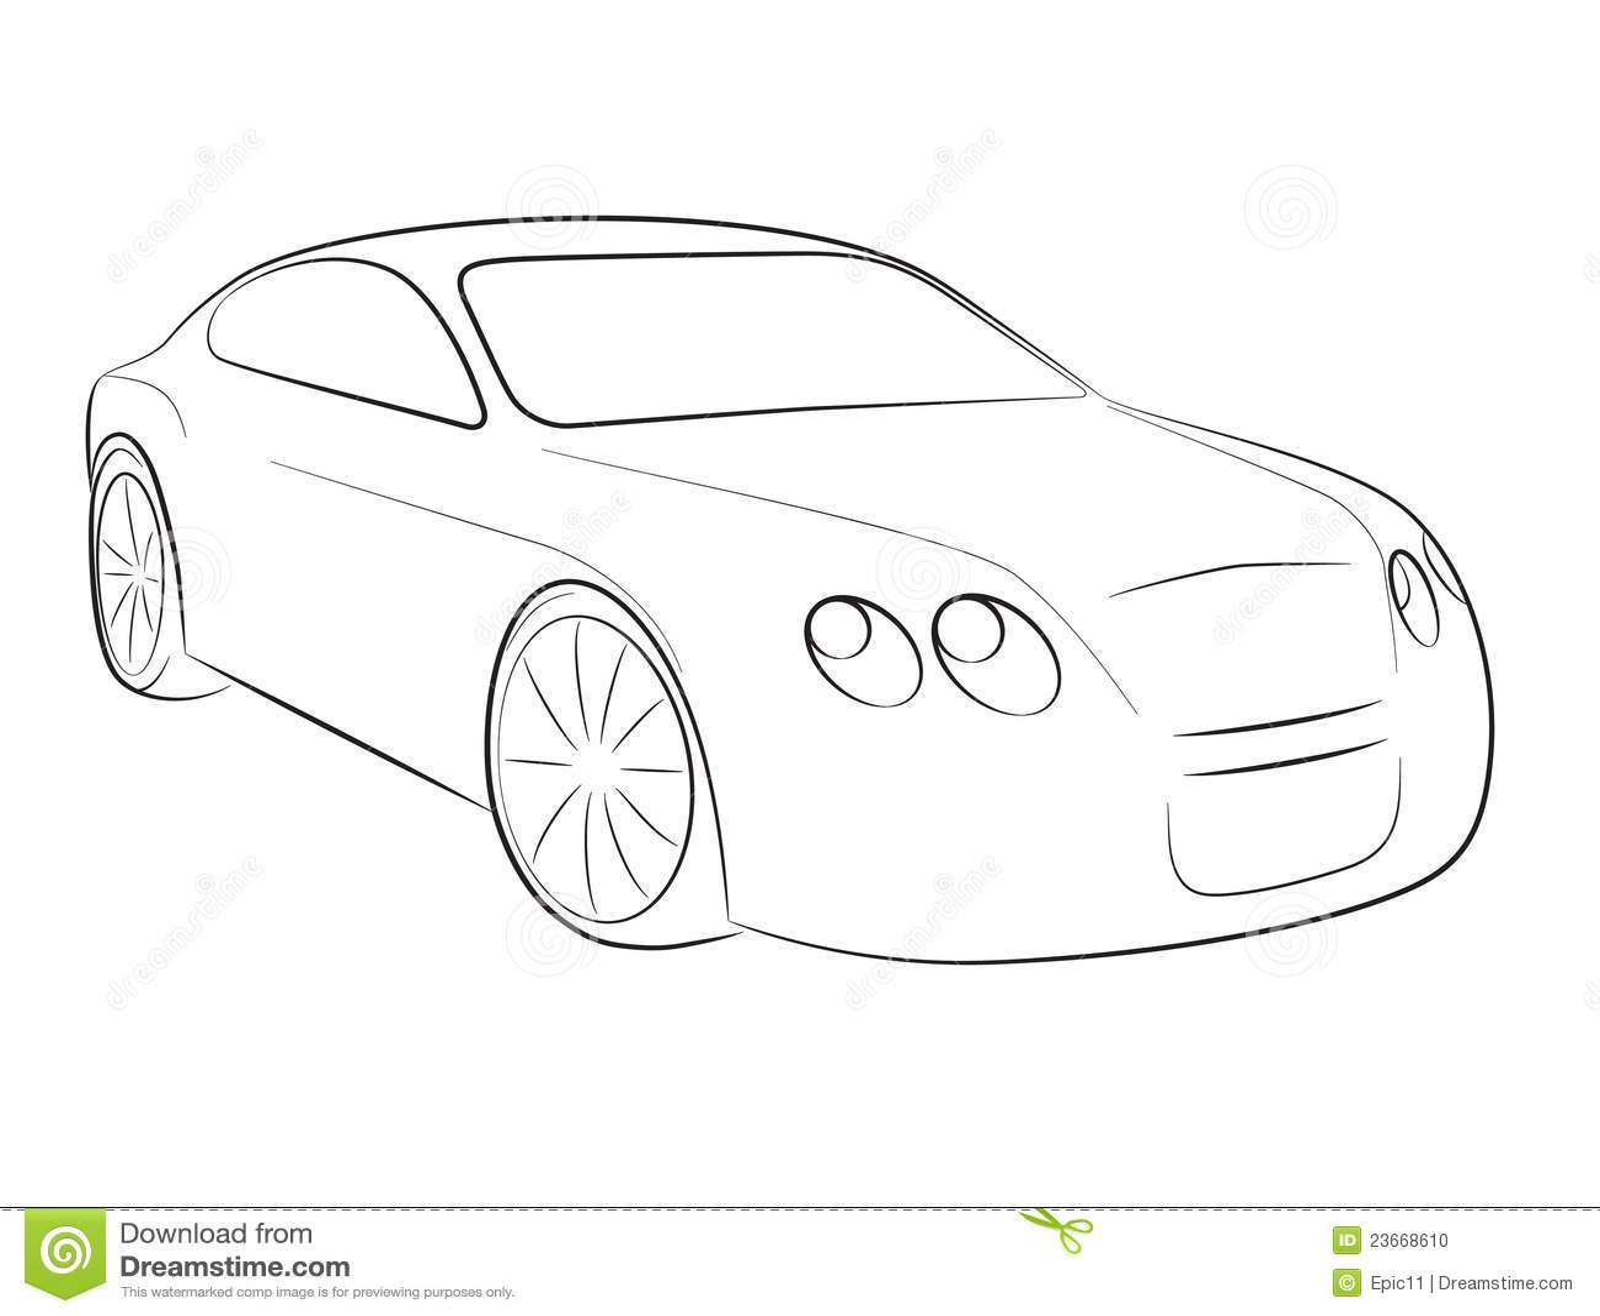 Cartoon Silhouette Of A Car Stock Vector